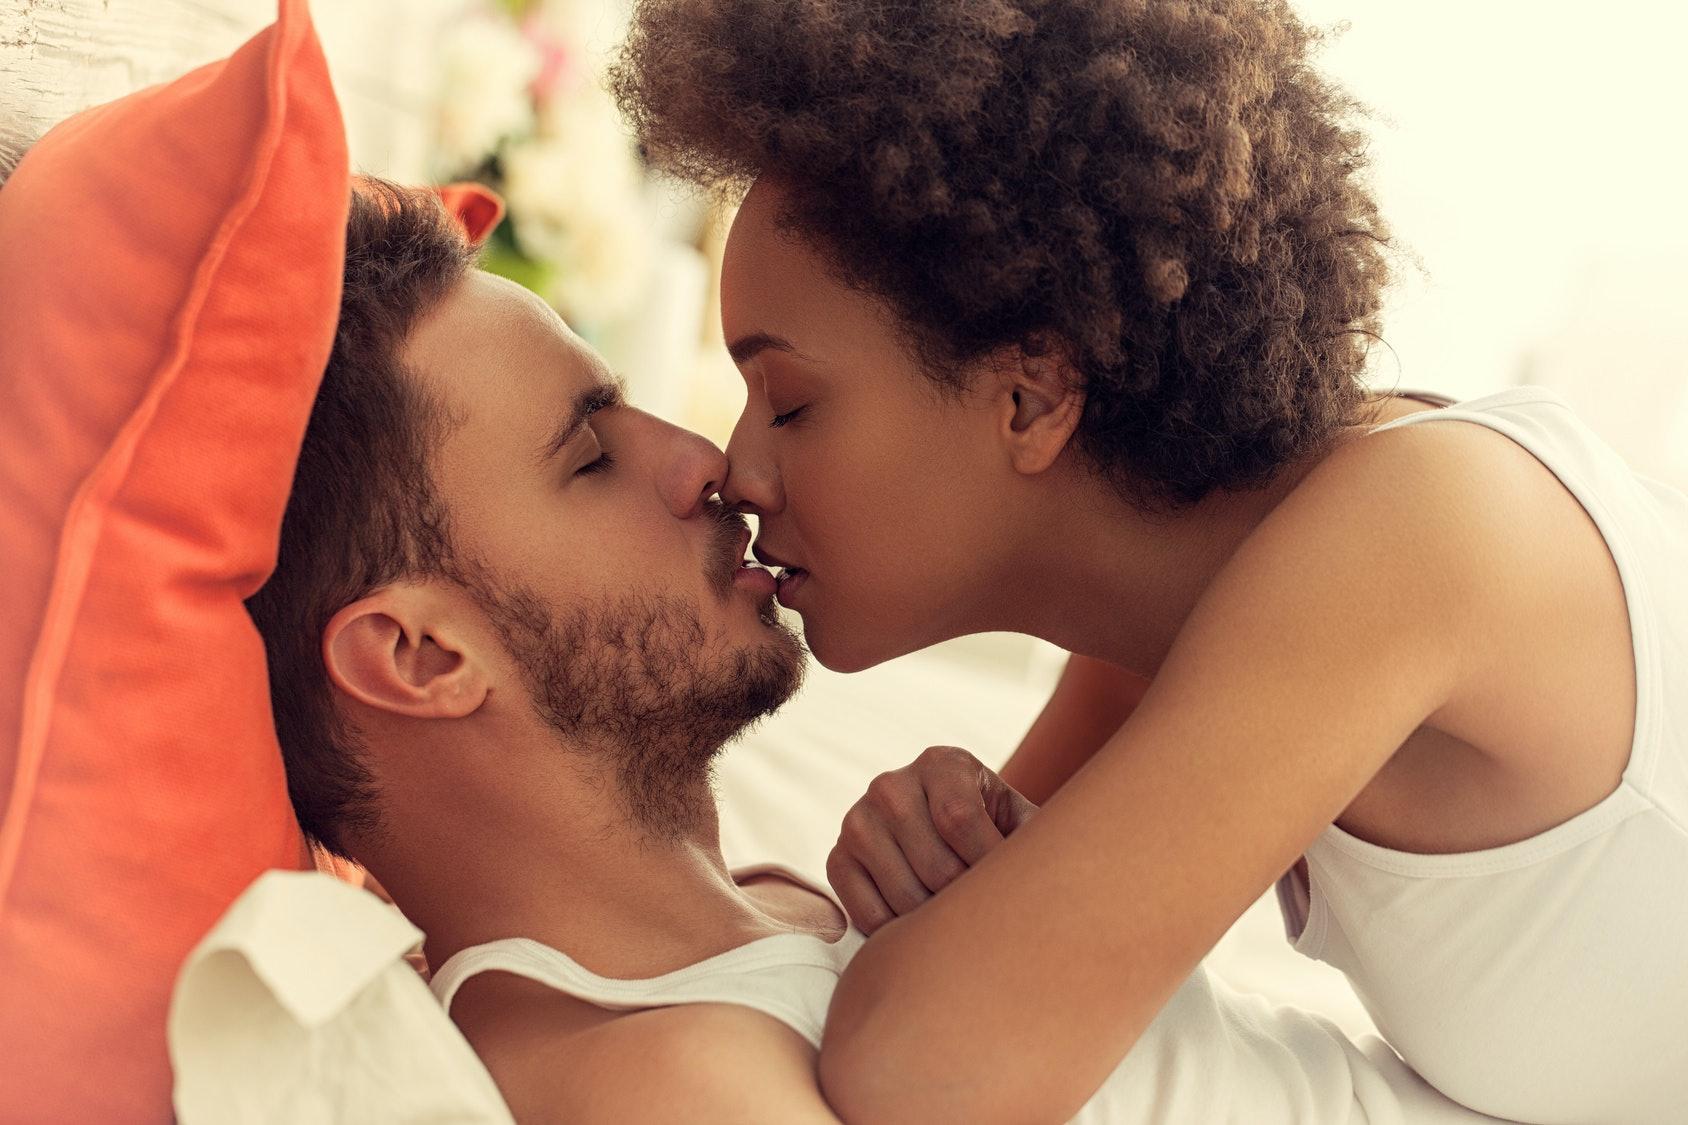 Interracial dating personal